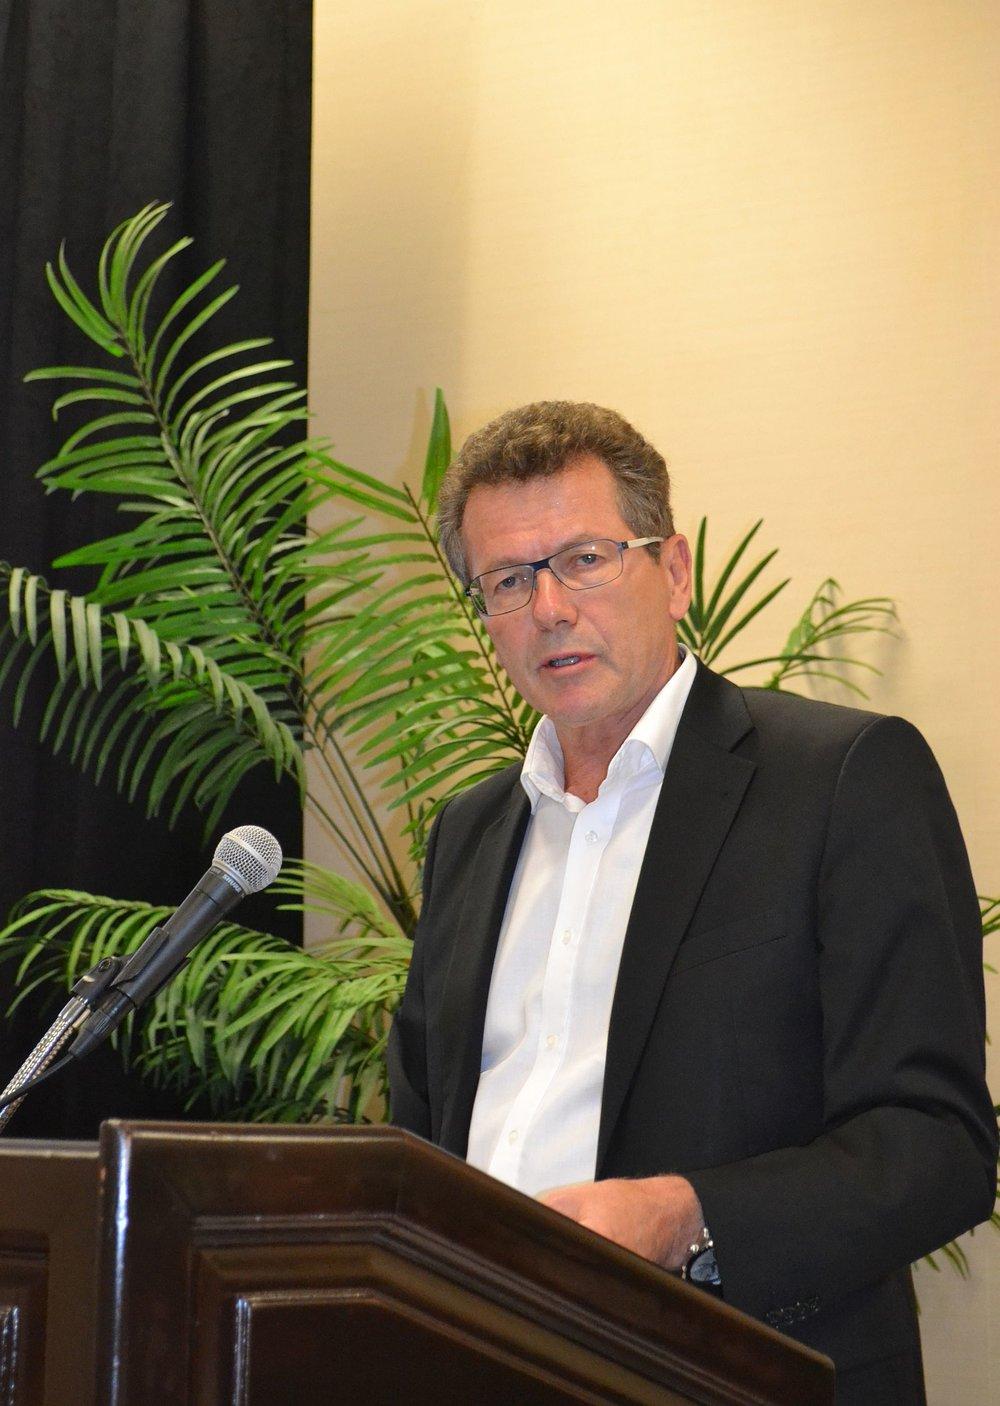 Ambassador Waldner